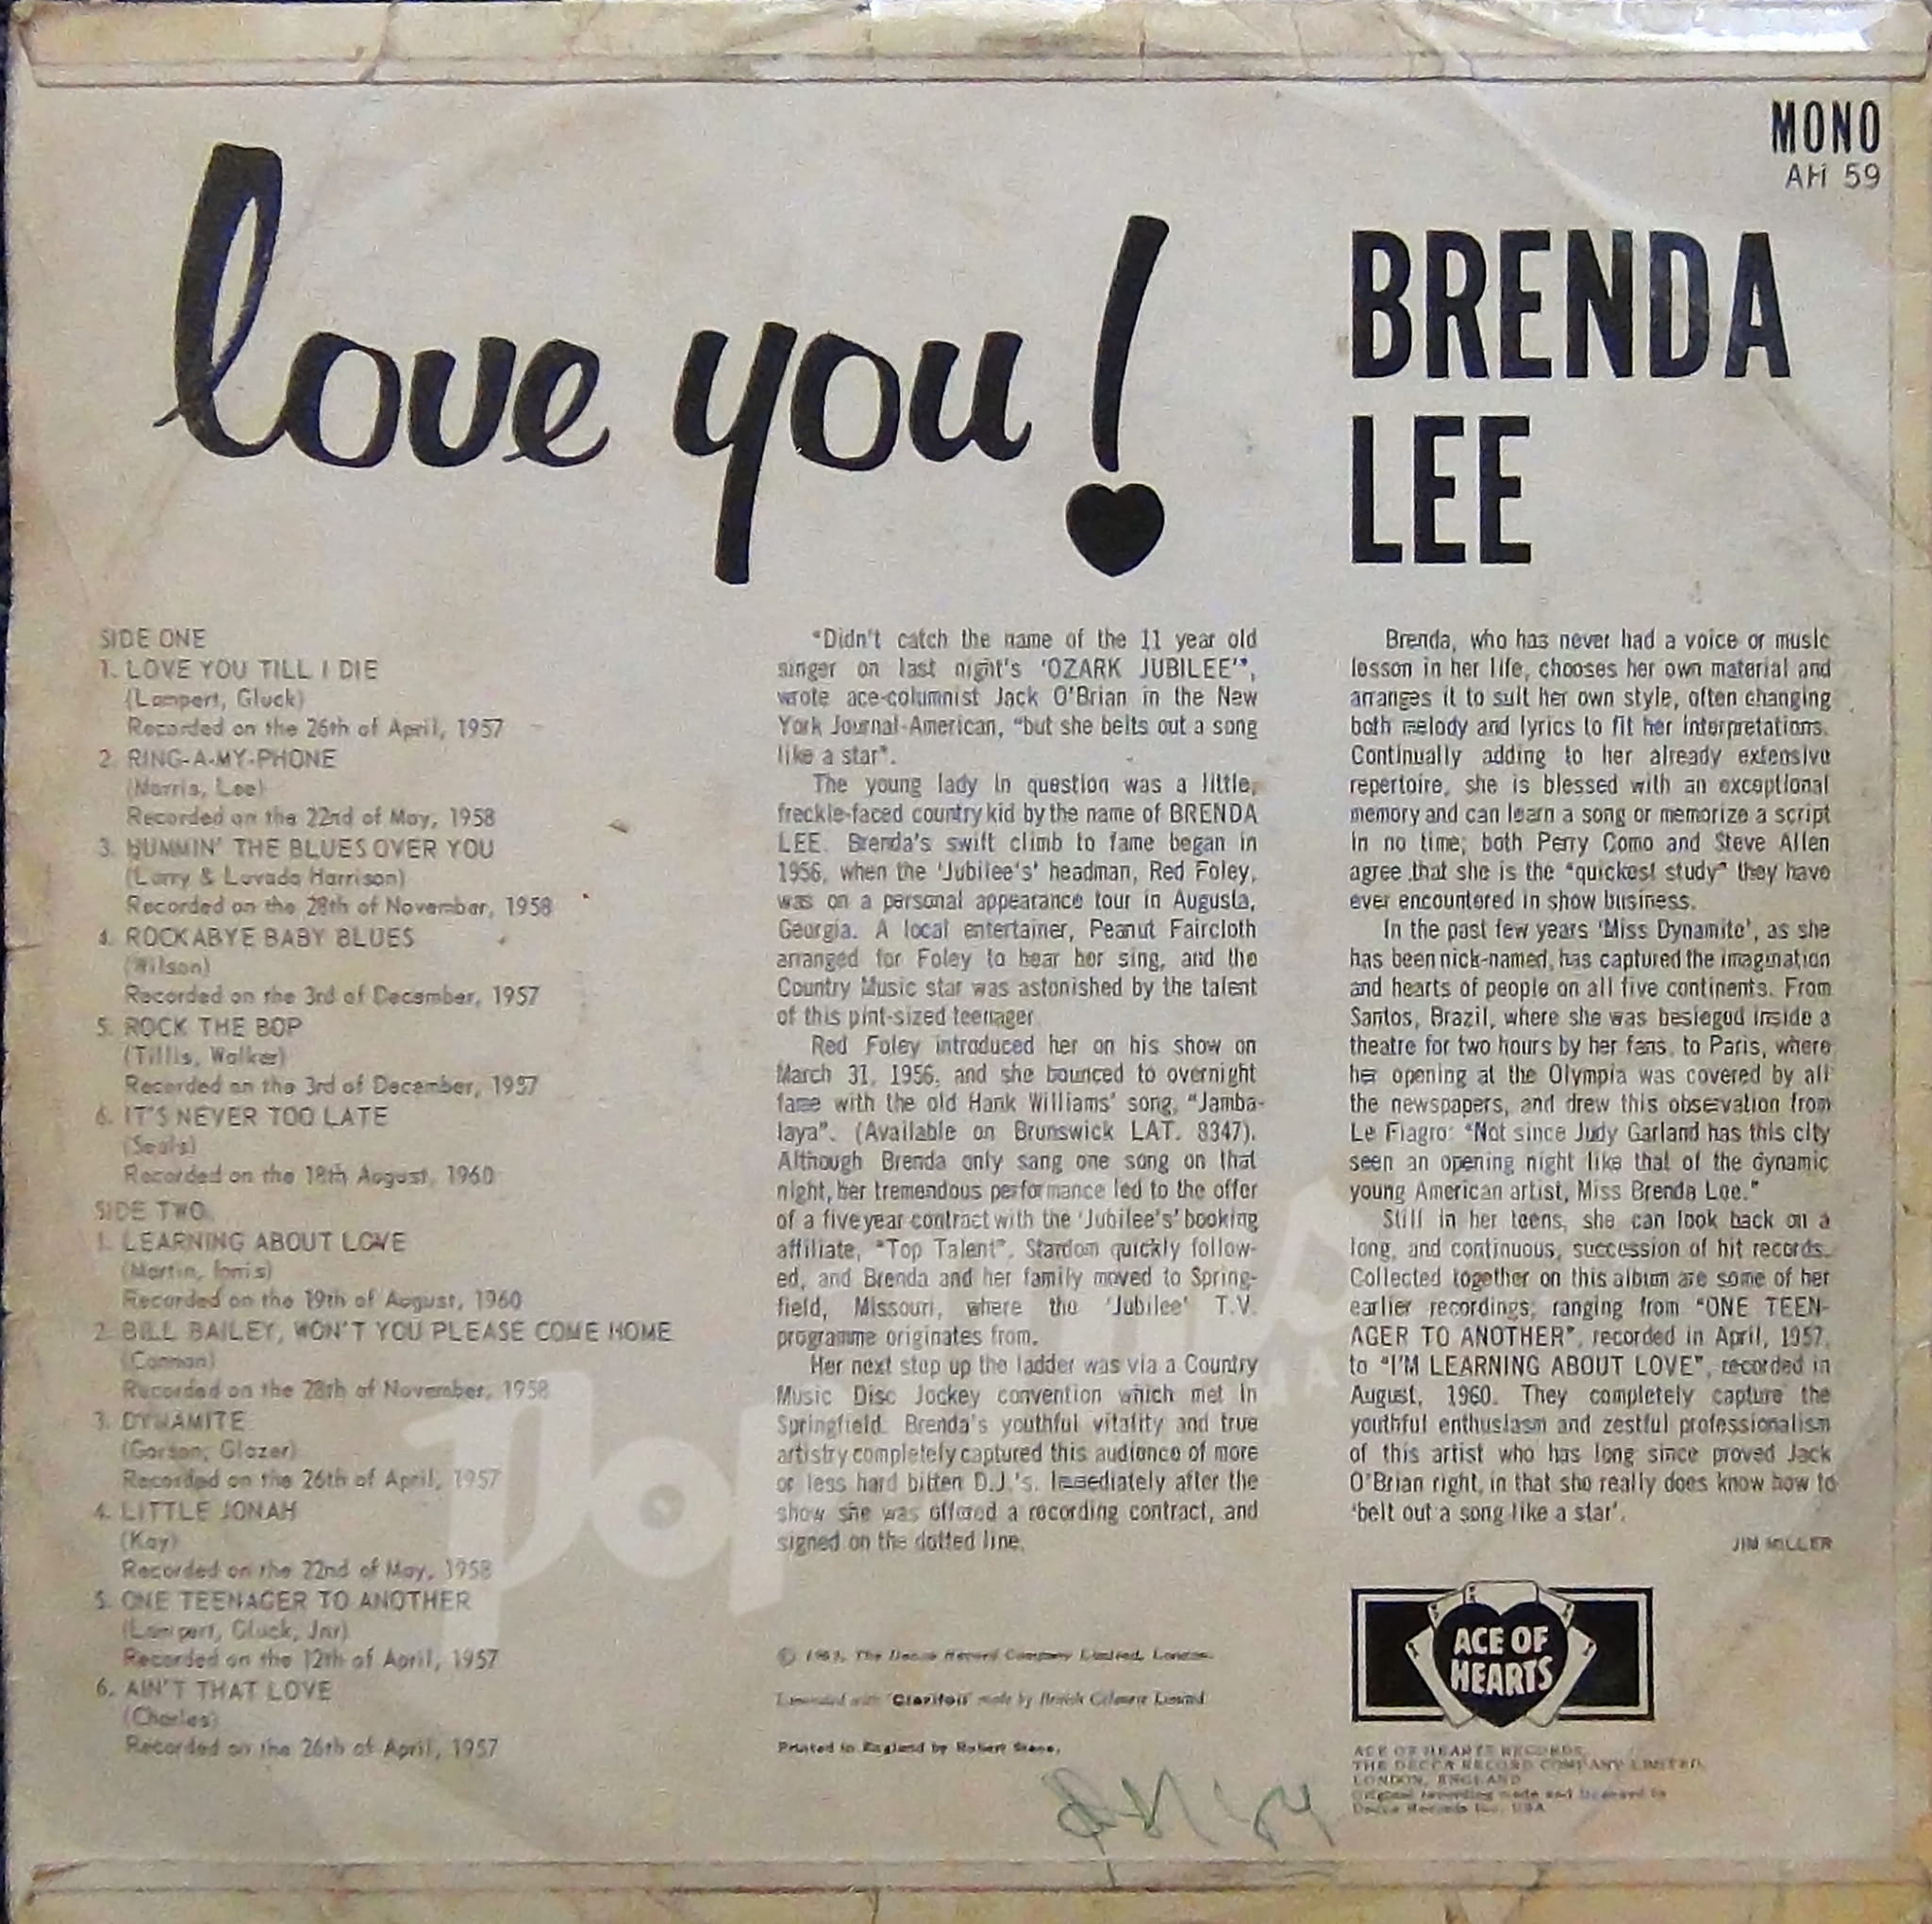 Brenda Lee Love You Ah 59 Bwk 117 1b Bwk 118 1b